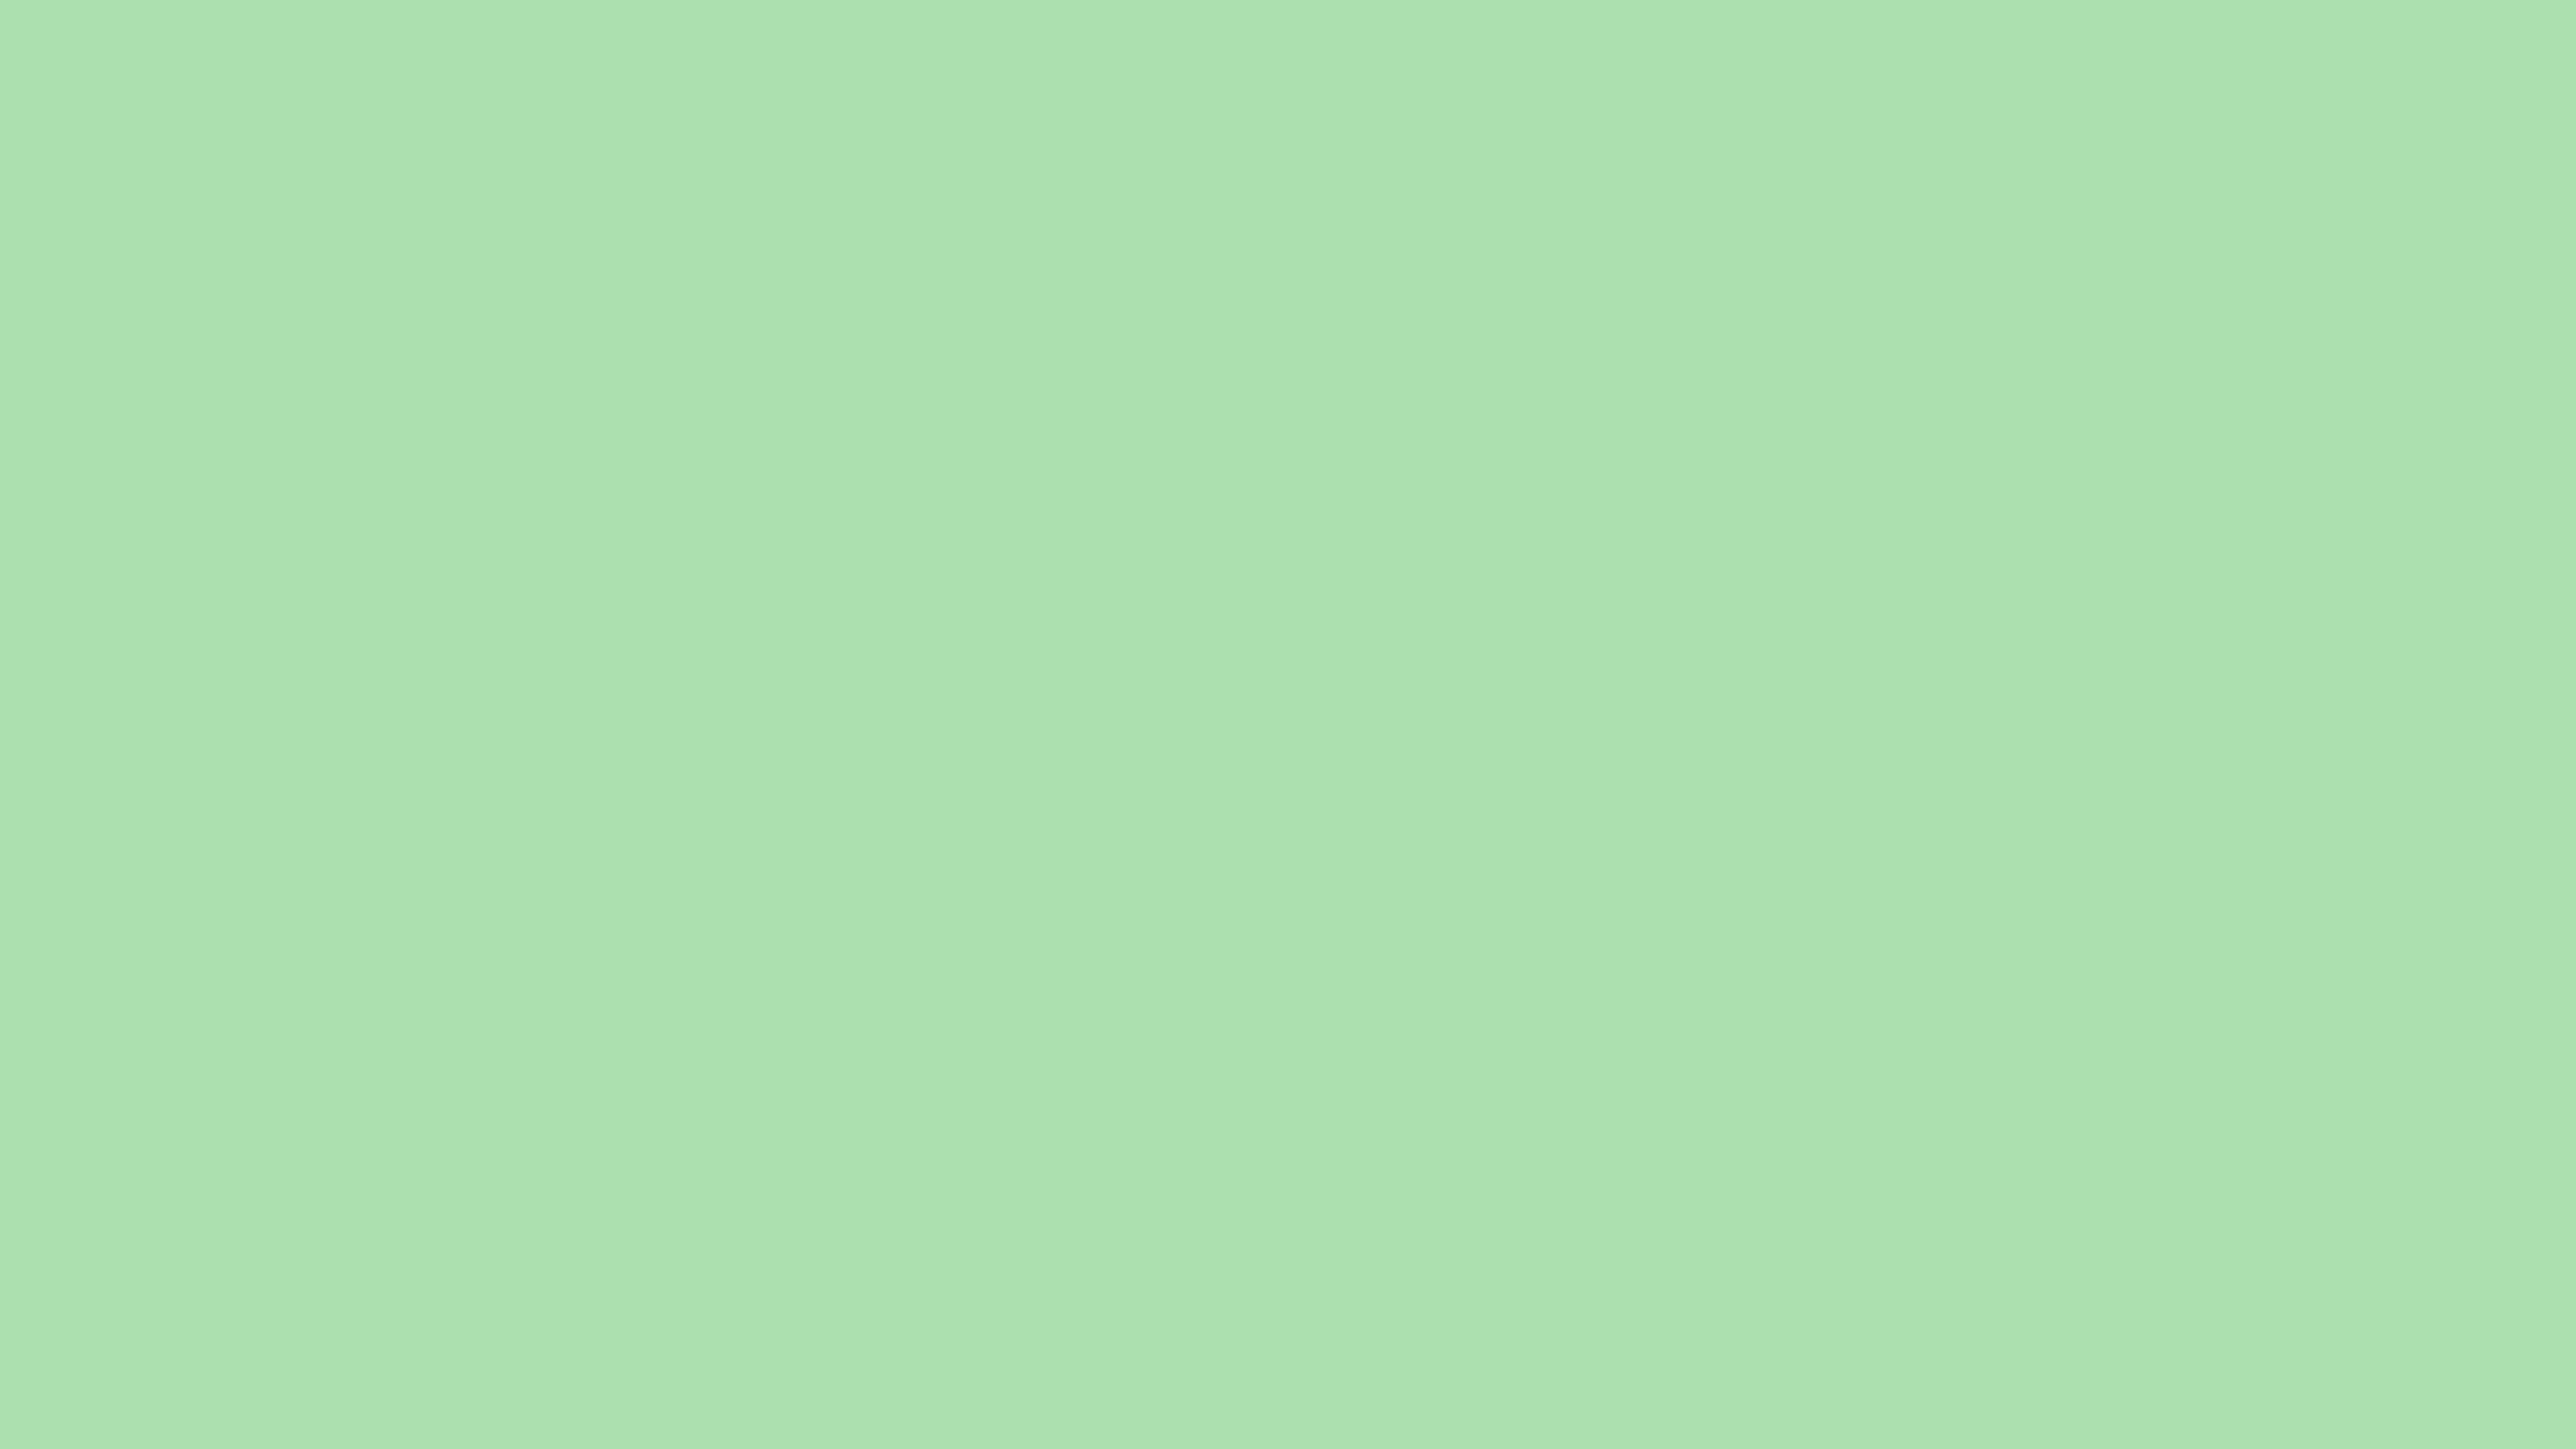 3840x2160 Celadon Solid Color Background